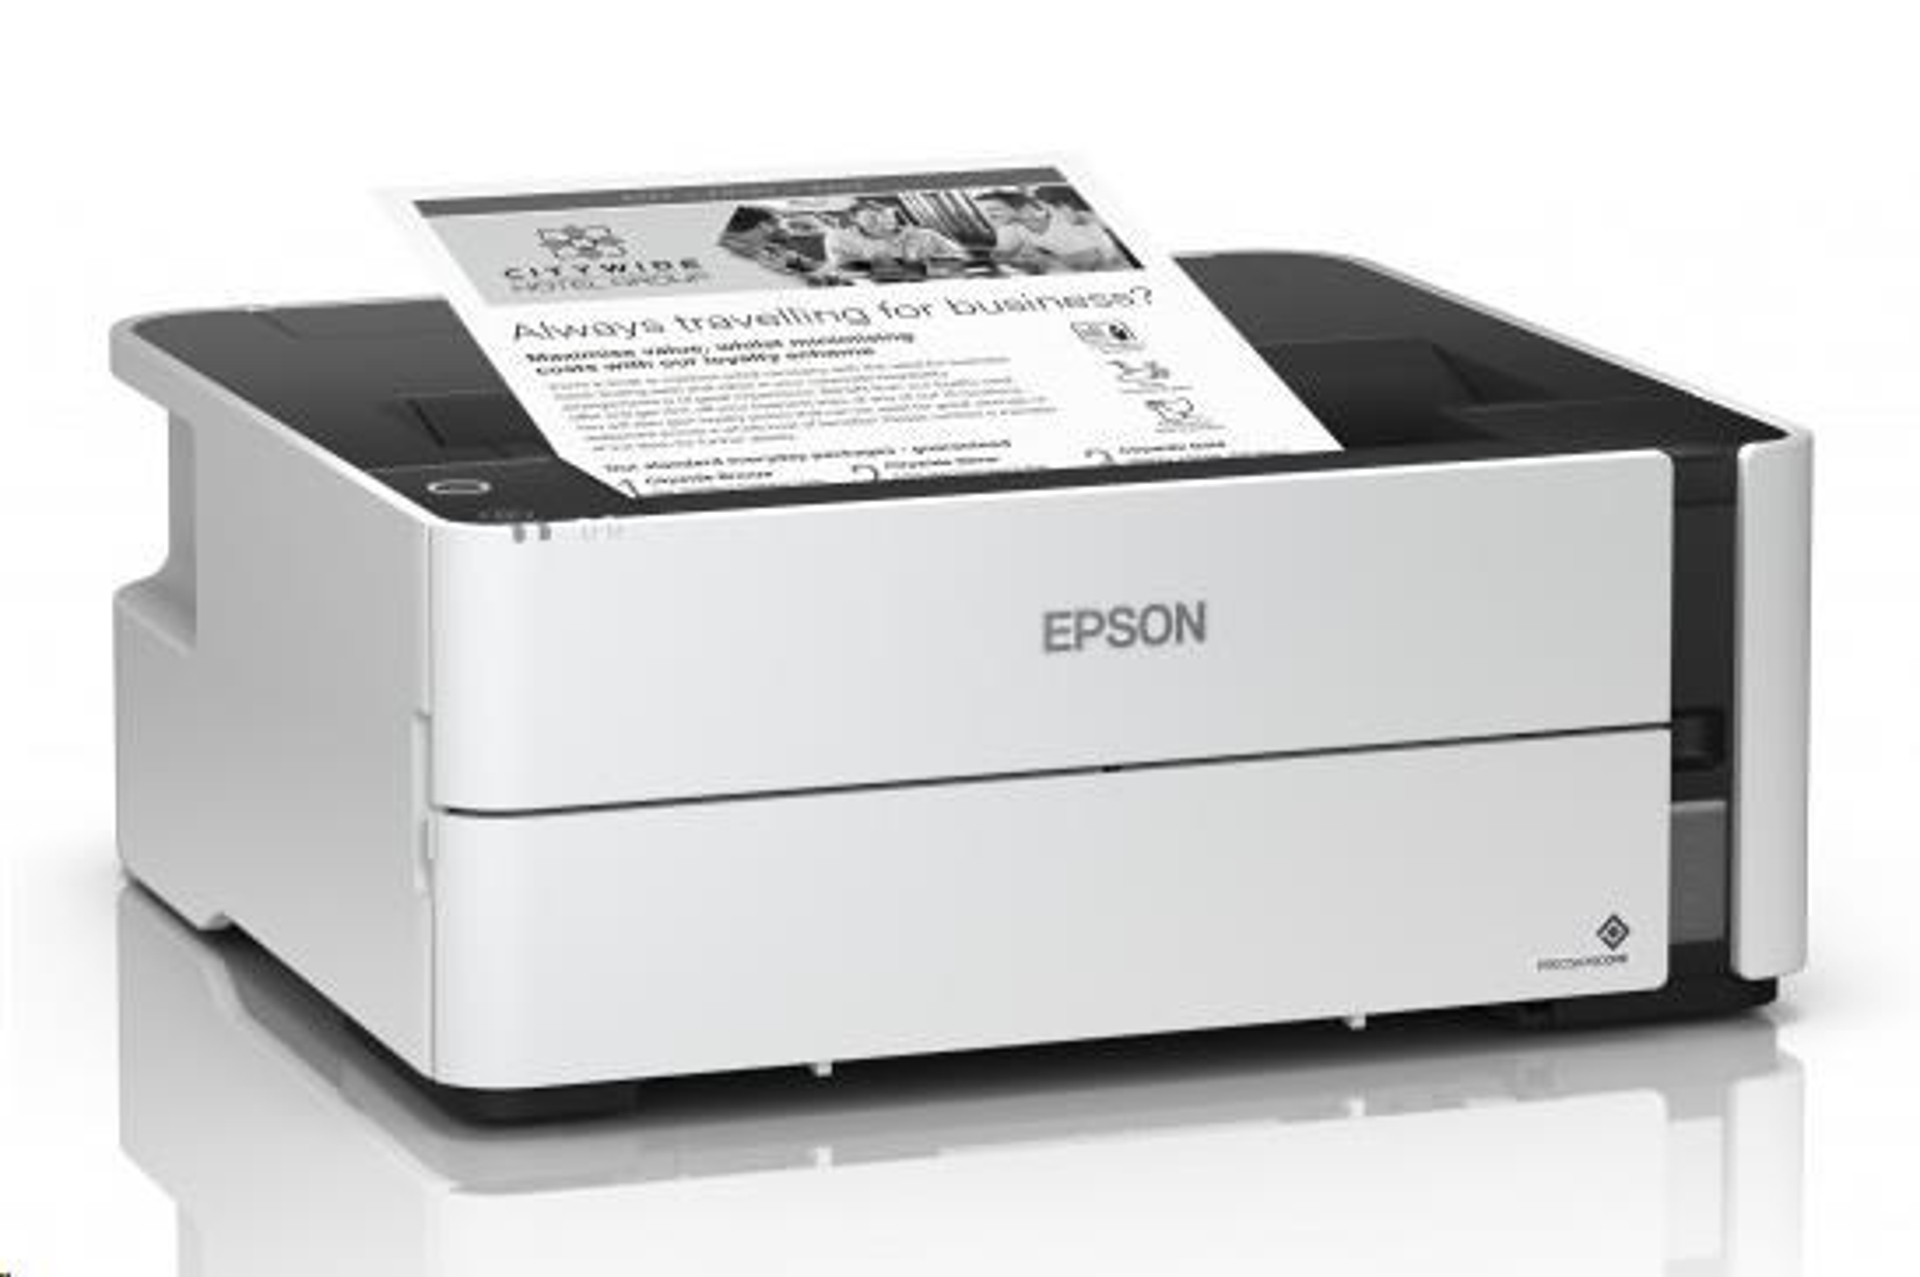 EPSON tiskárna ink EcoTank M1170, 1200x2400 dpi, A4, 39ppm, USB 2.0, Duplex